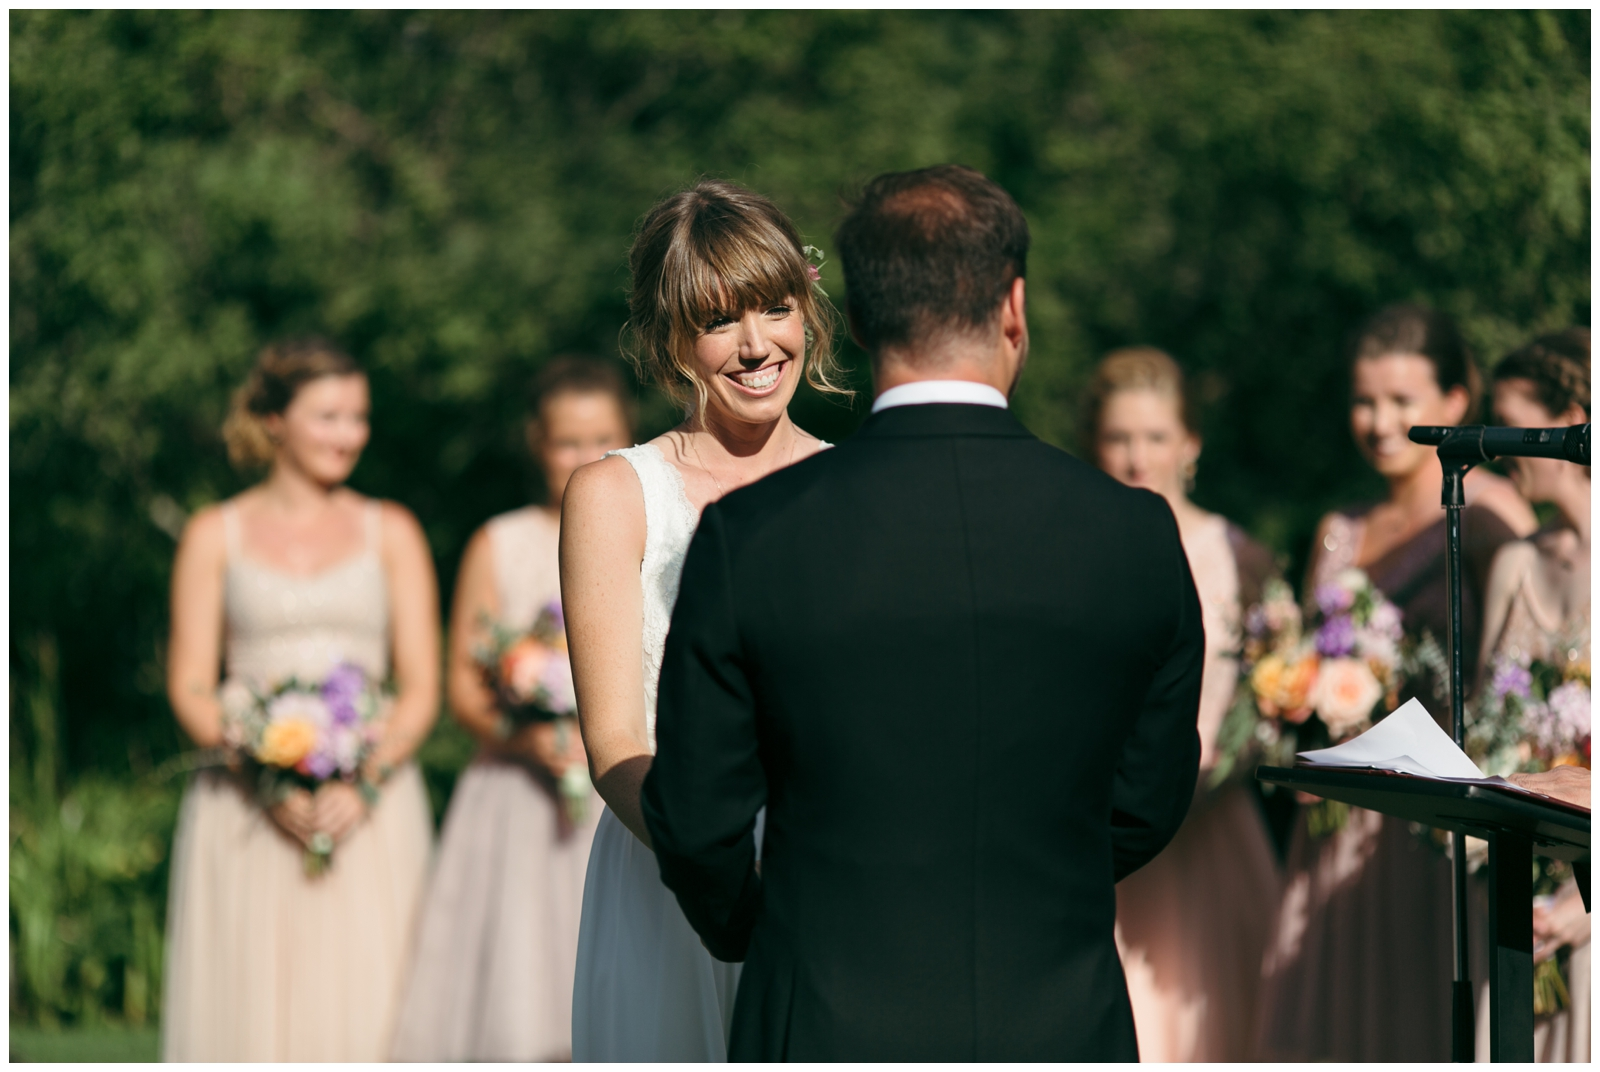 Moraine-Farm-wedding-Bailey-Q-Photo-Massachusetts-wedding-photpgrapher-061.jpg